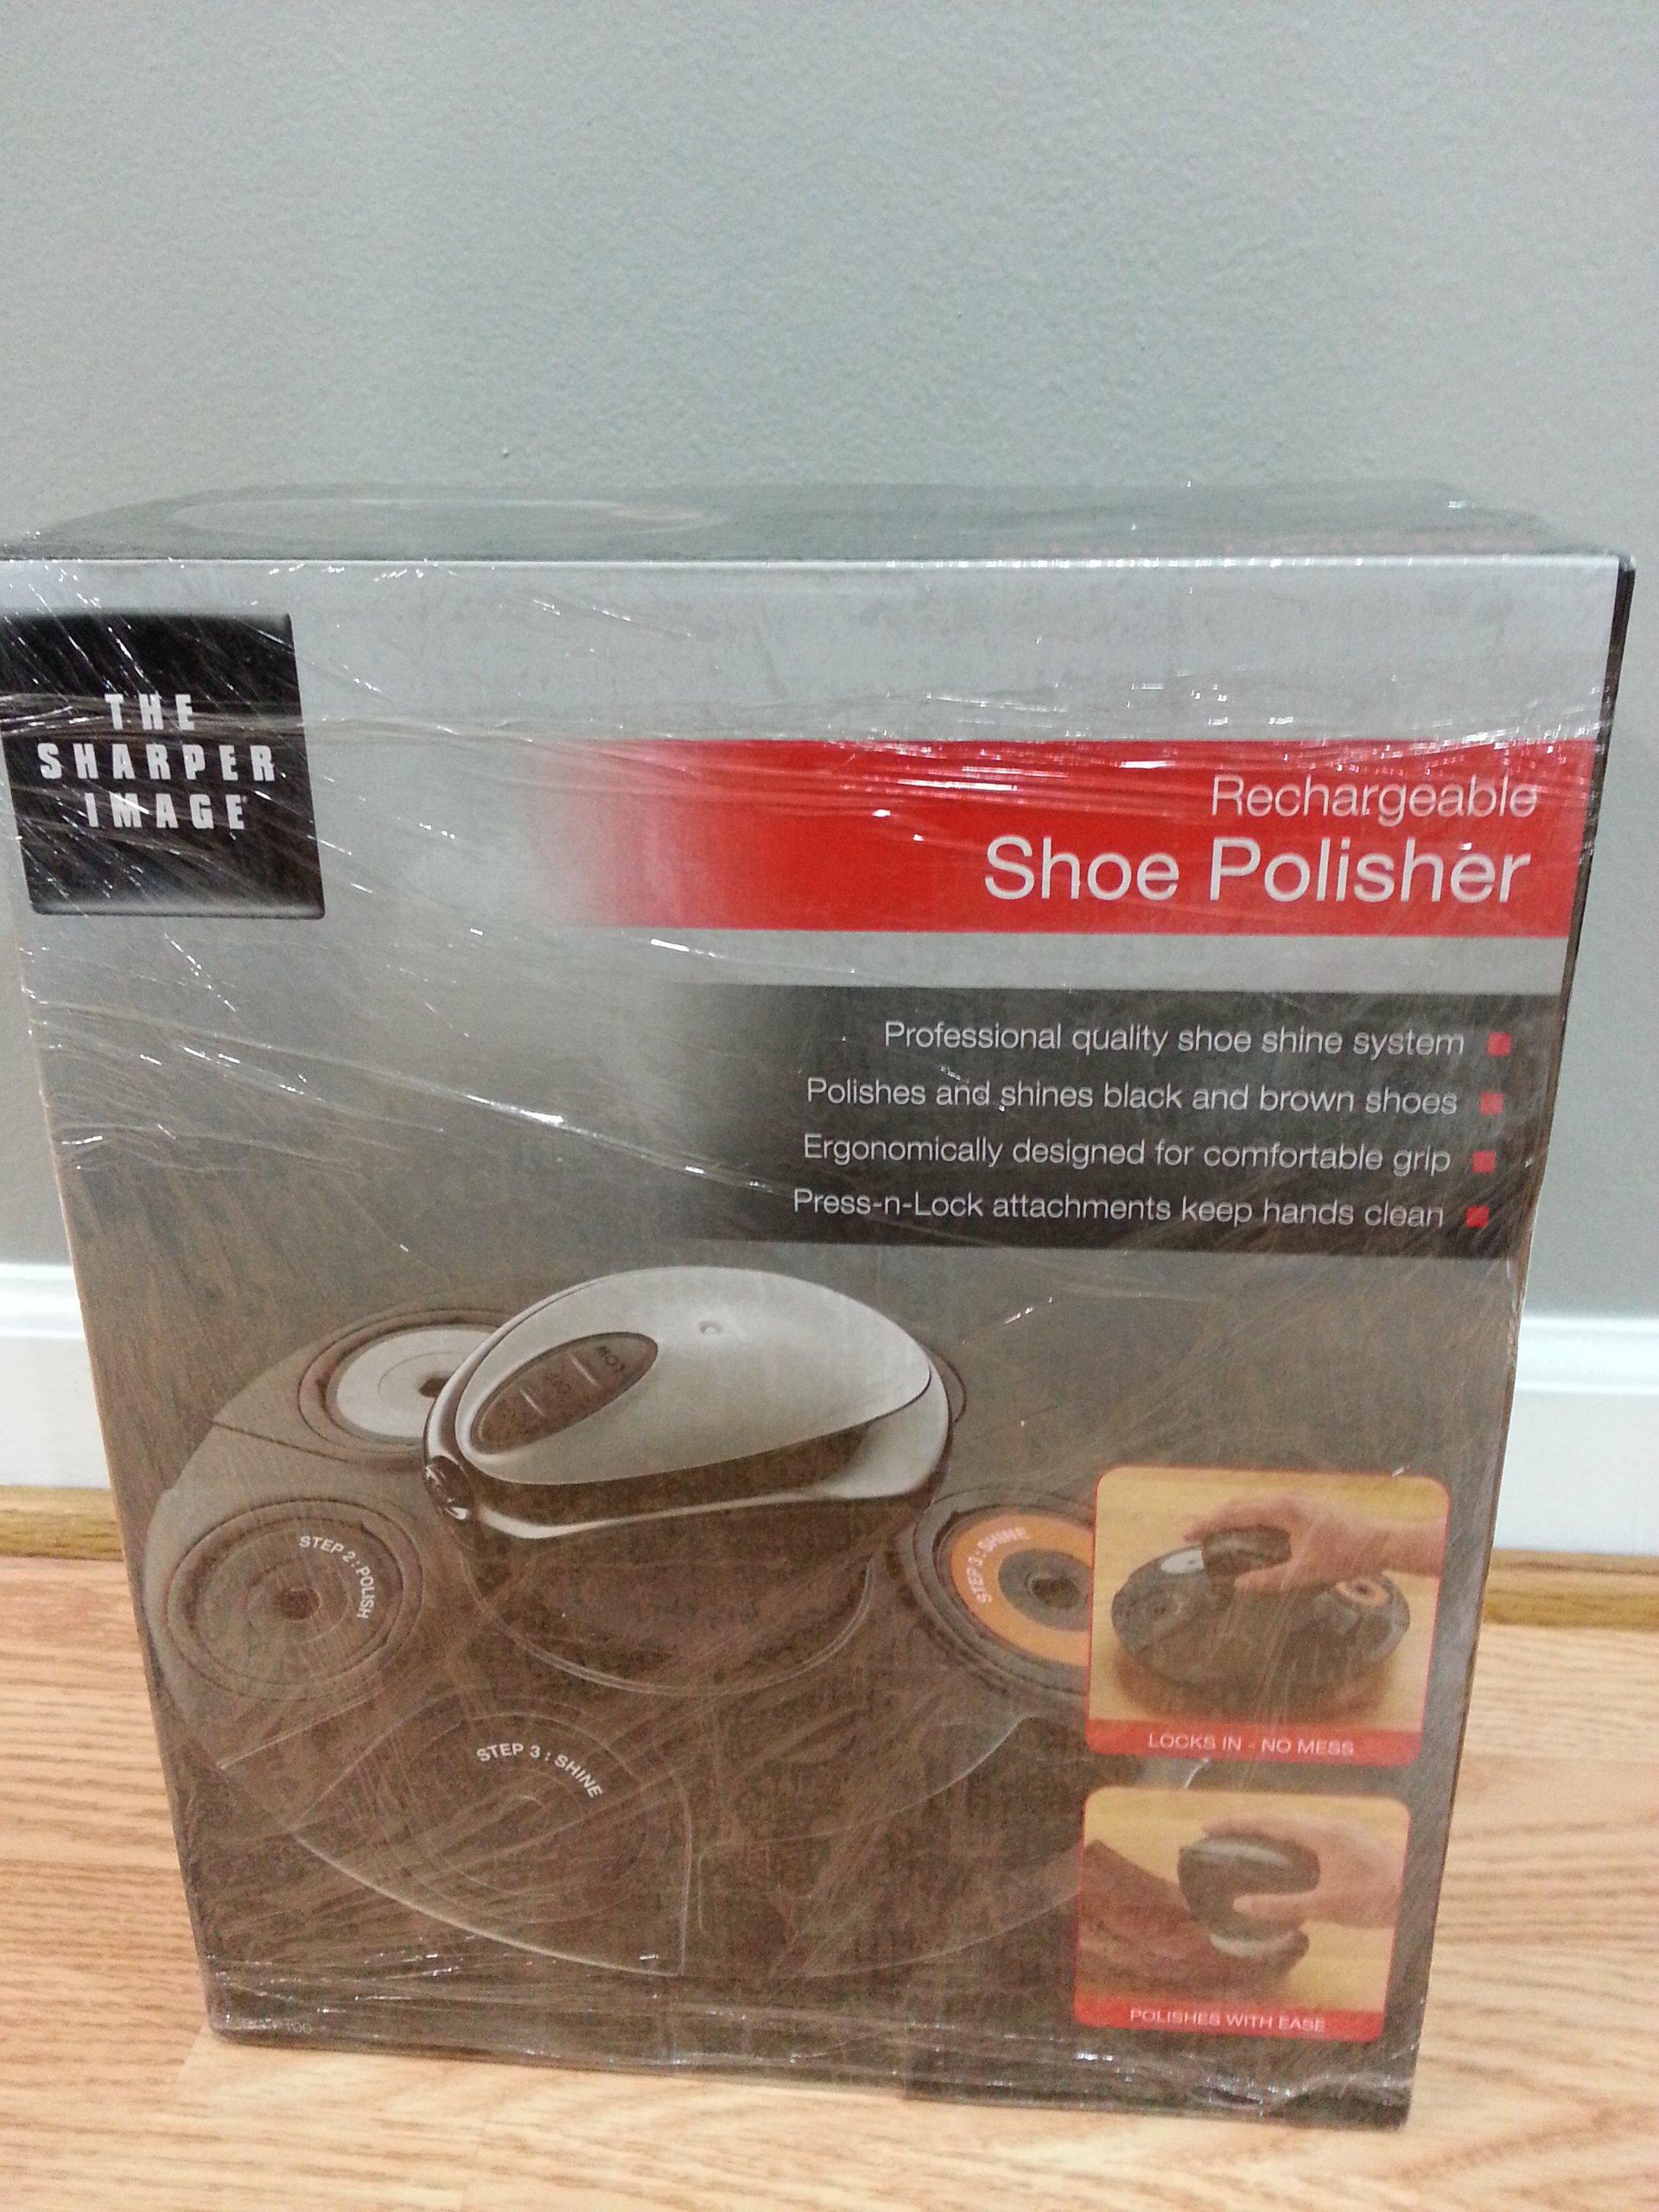 The Sharper Image Portable Electric Shoe Polisher, Black